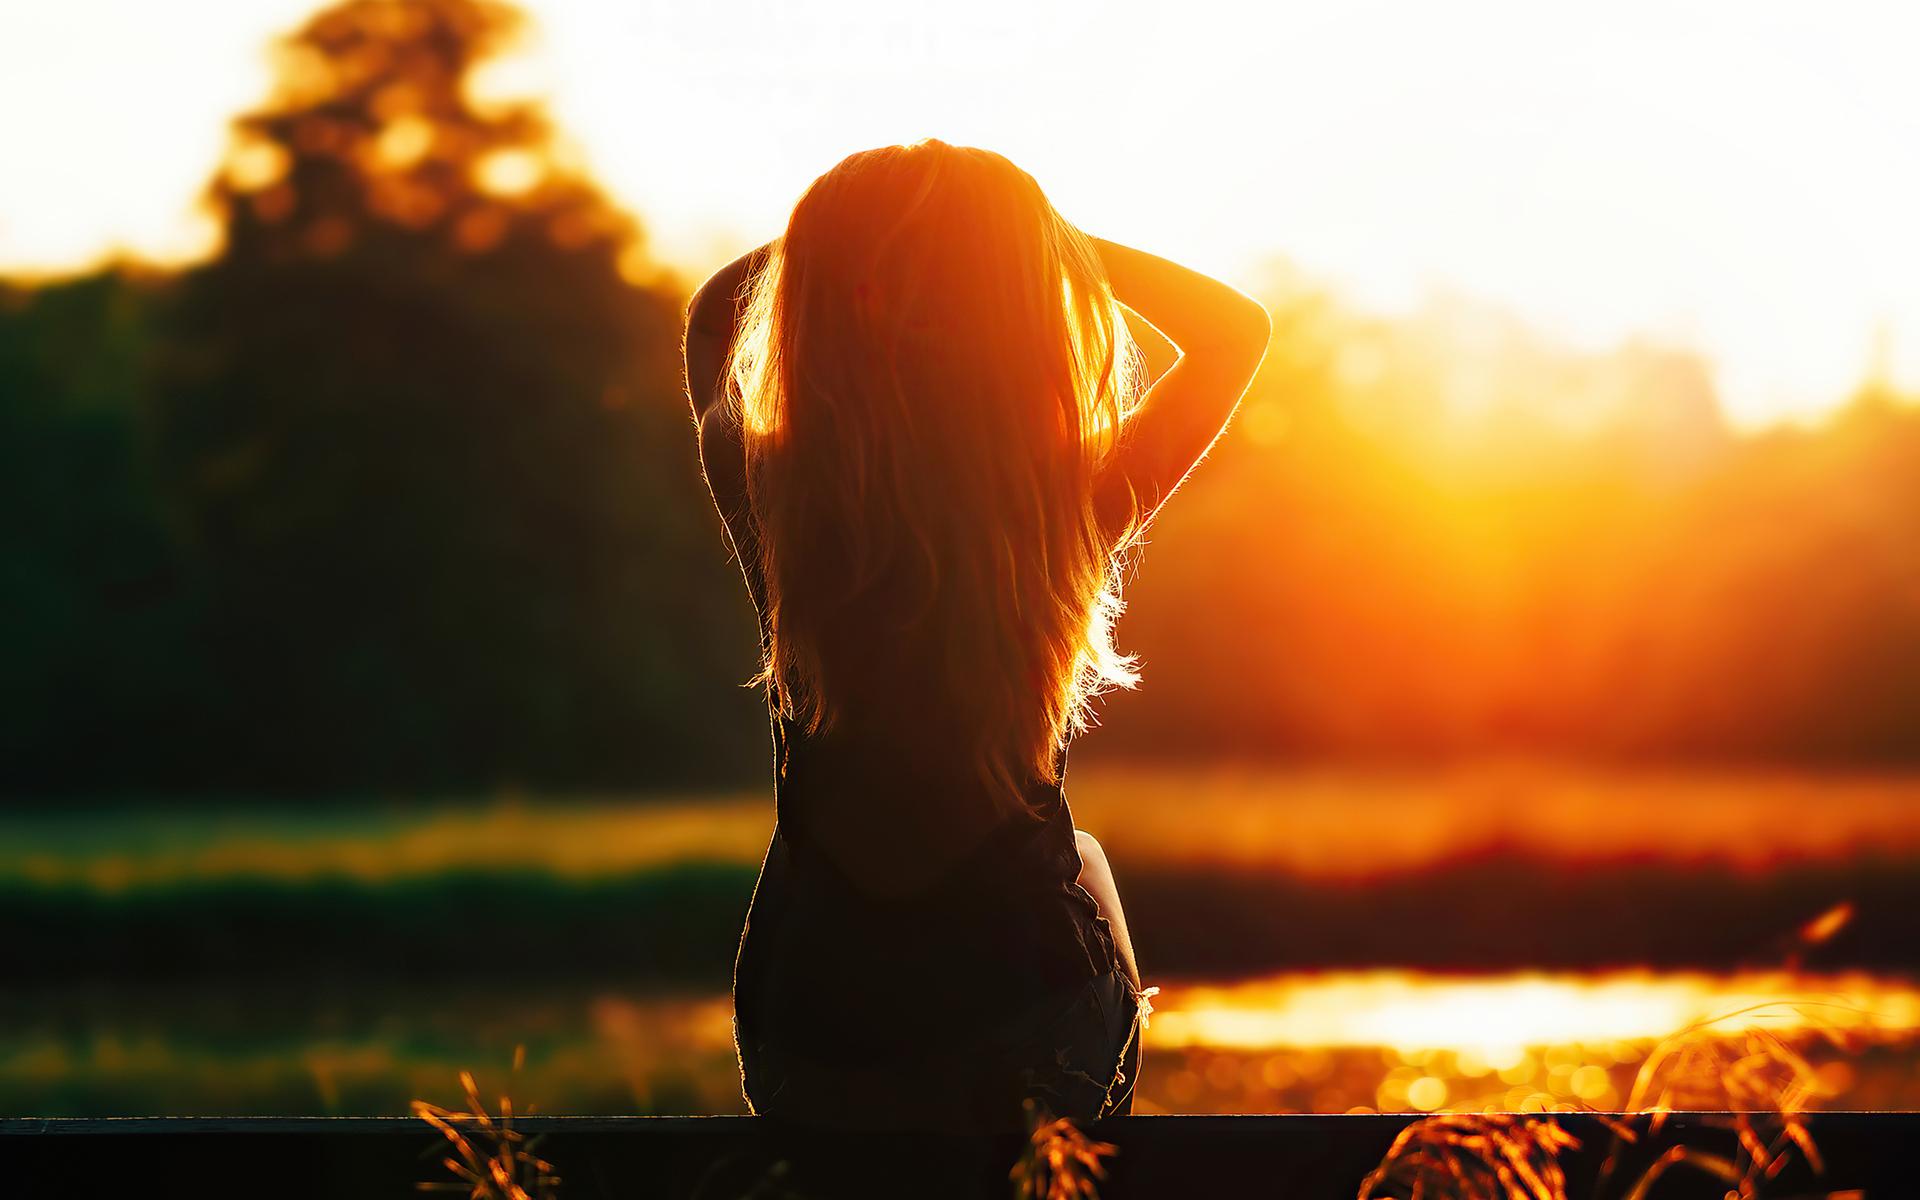 girl-sitting-looking-at-sunset-silhouette-4k-q8.jpg